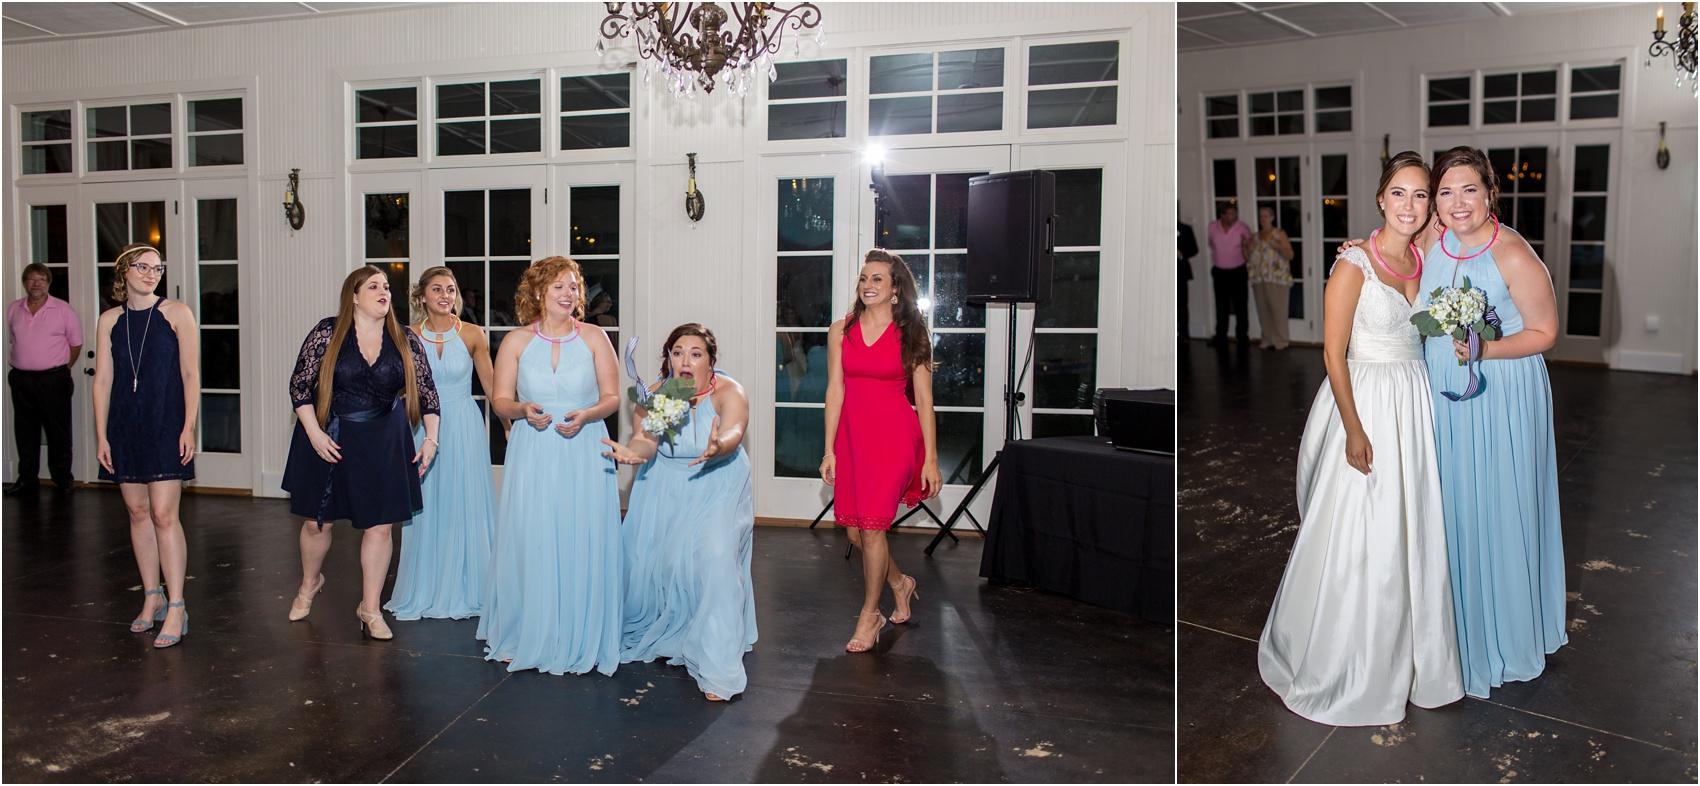 Savannah Eve Photography- Sigl-Adams Wedding- Sneak Peek-91.jpg